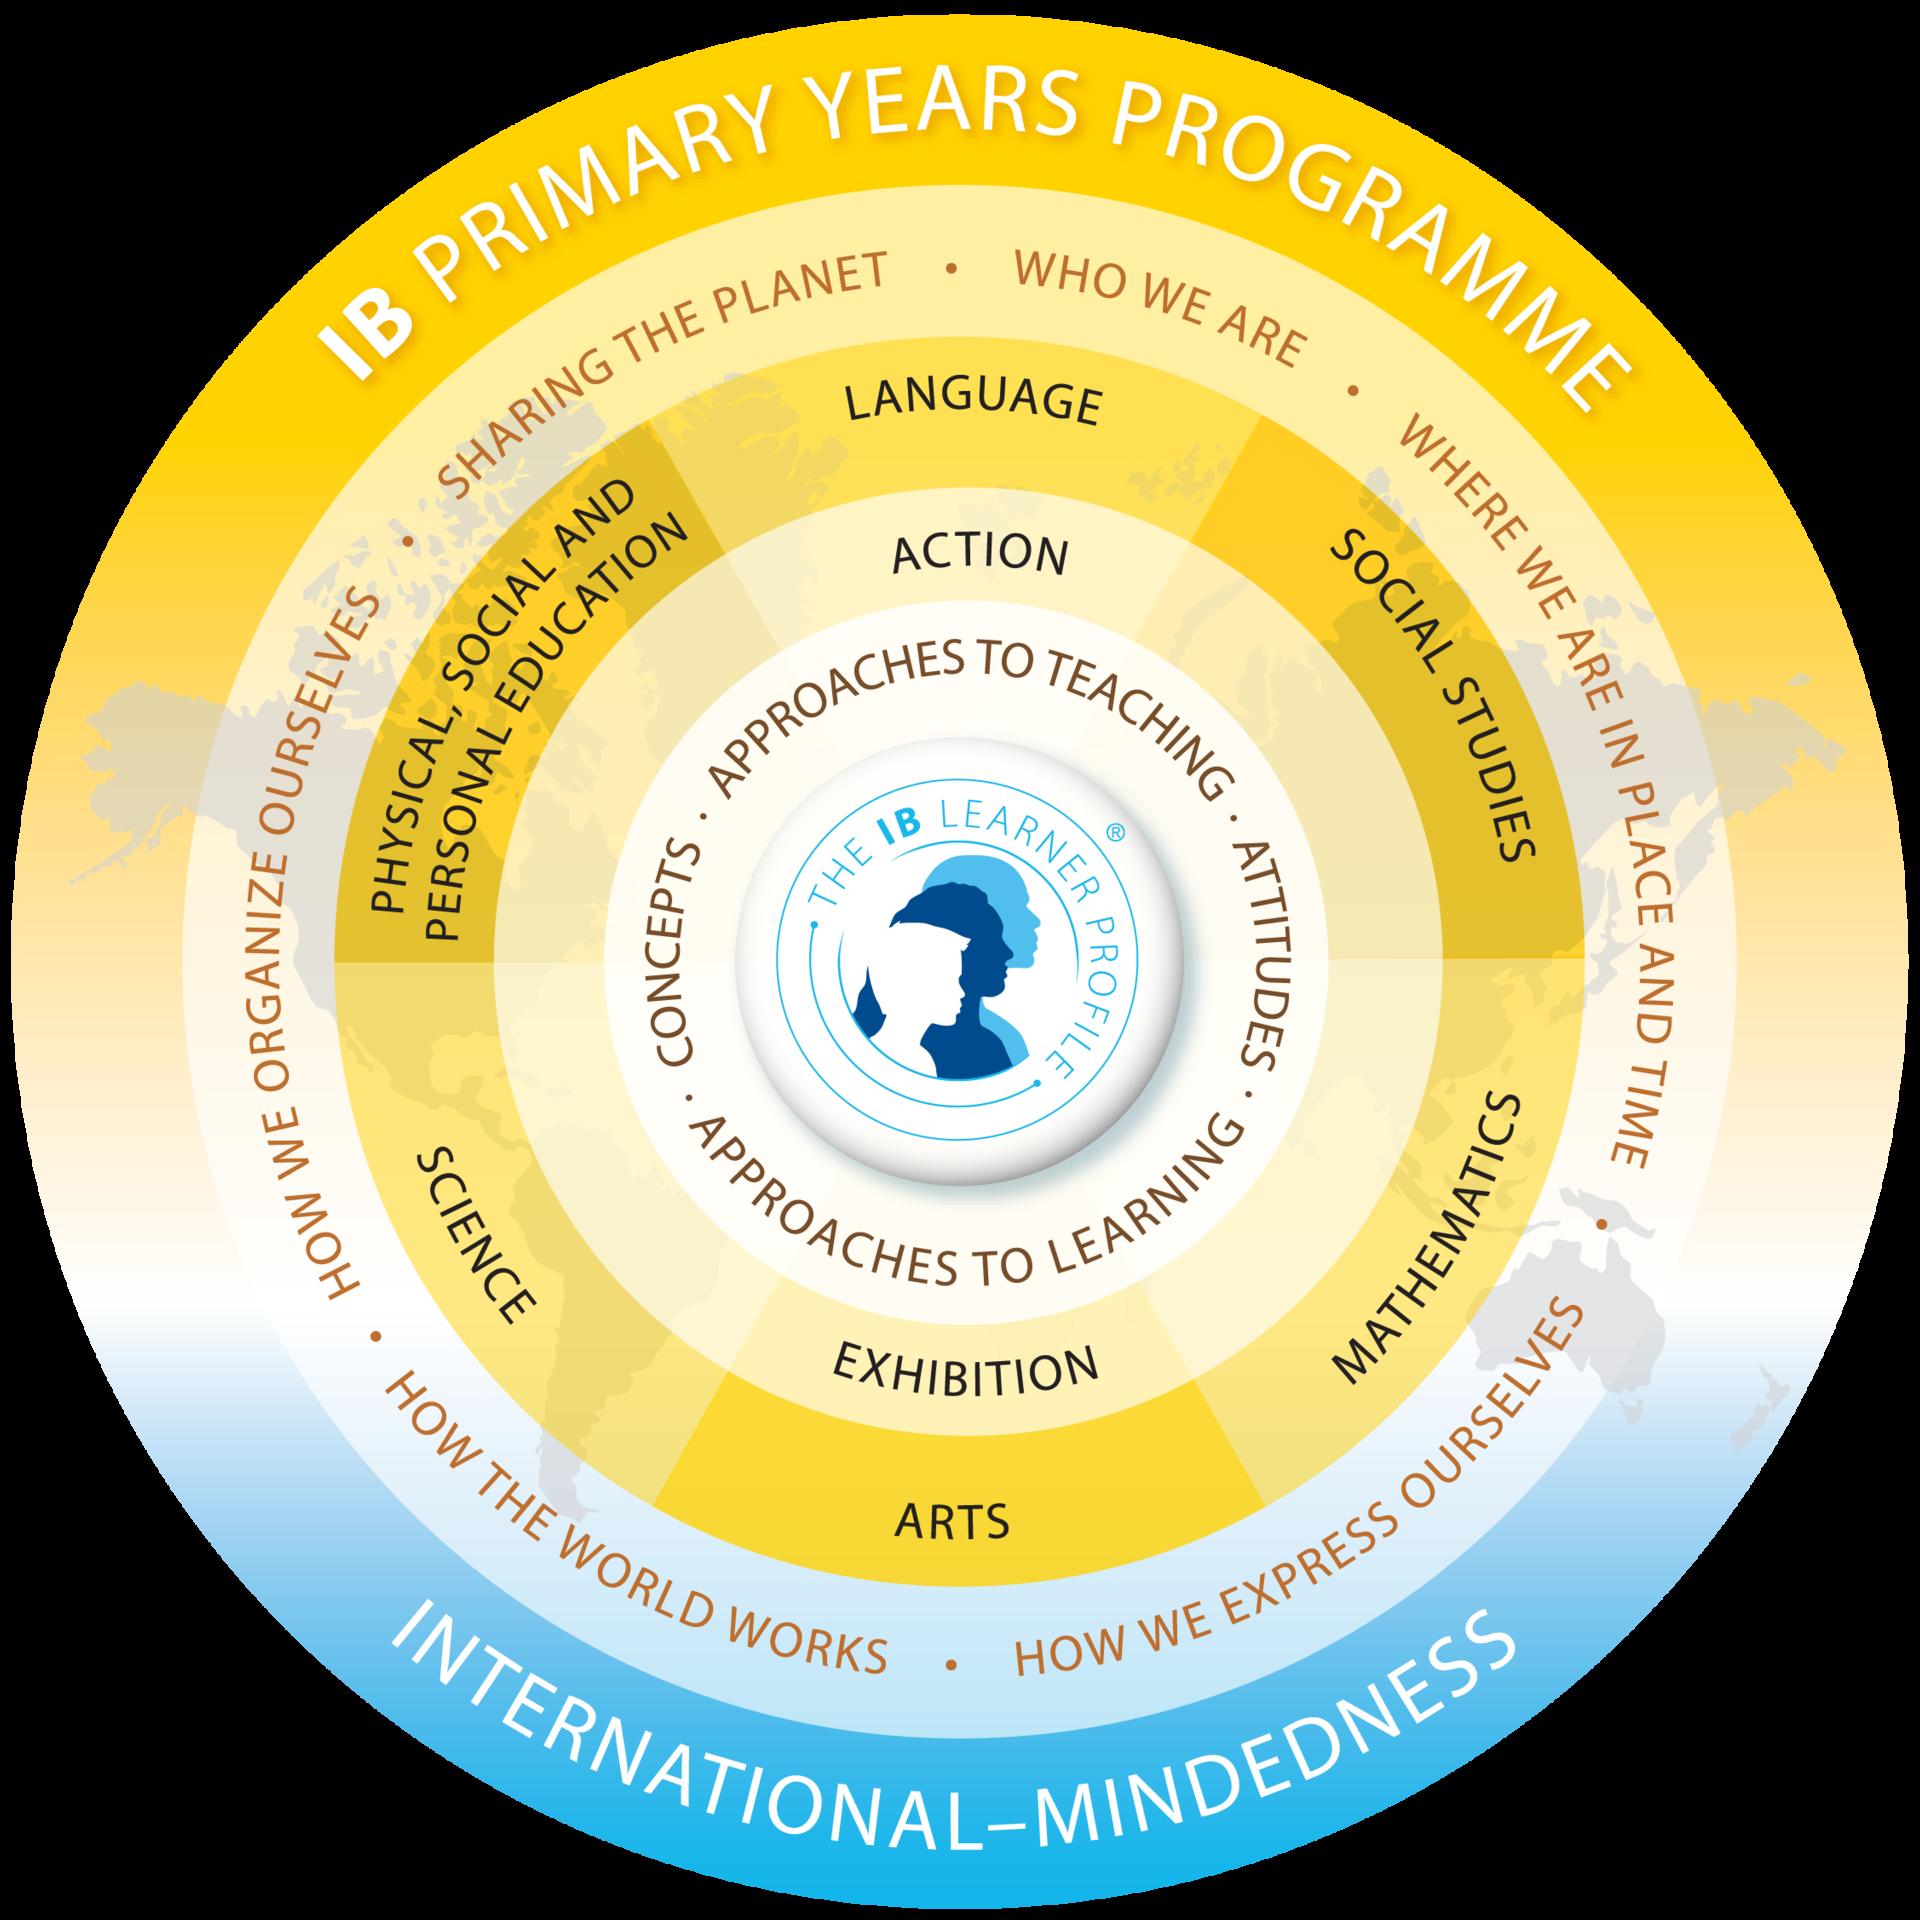 PYP Program Model